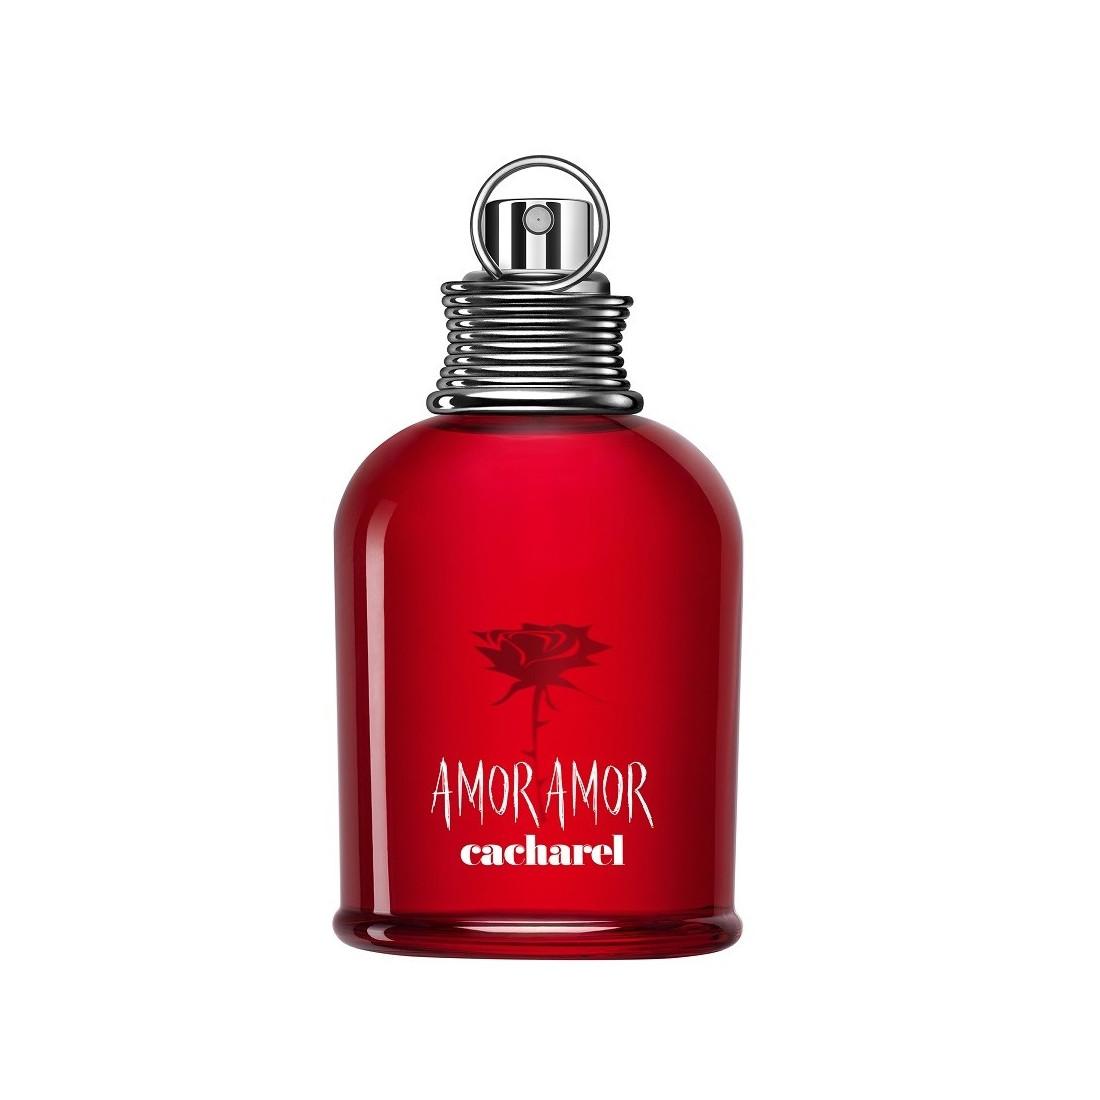 Cacharel Amor Amor Eau De Toilette Spray 30 Ml Women Perfumes Perfumes